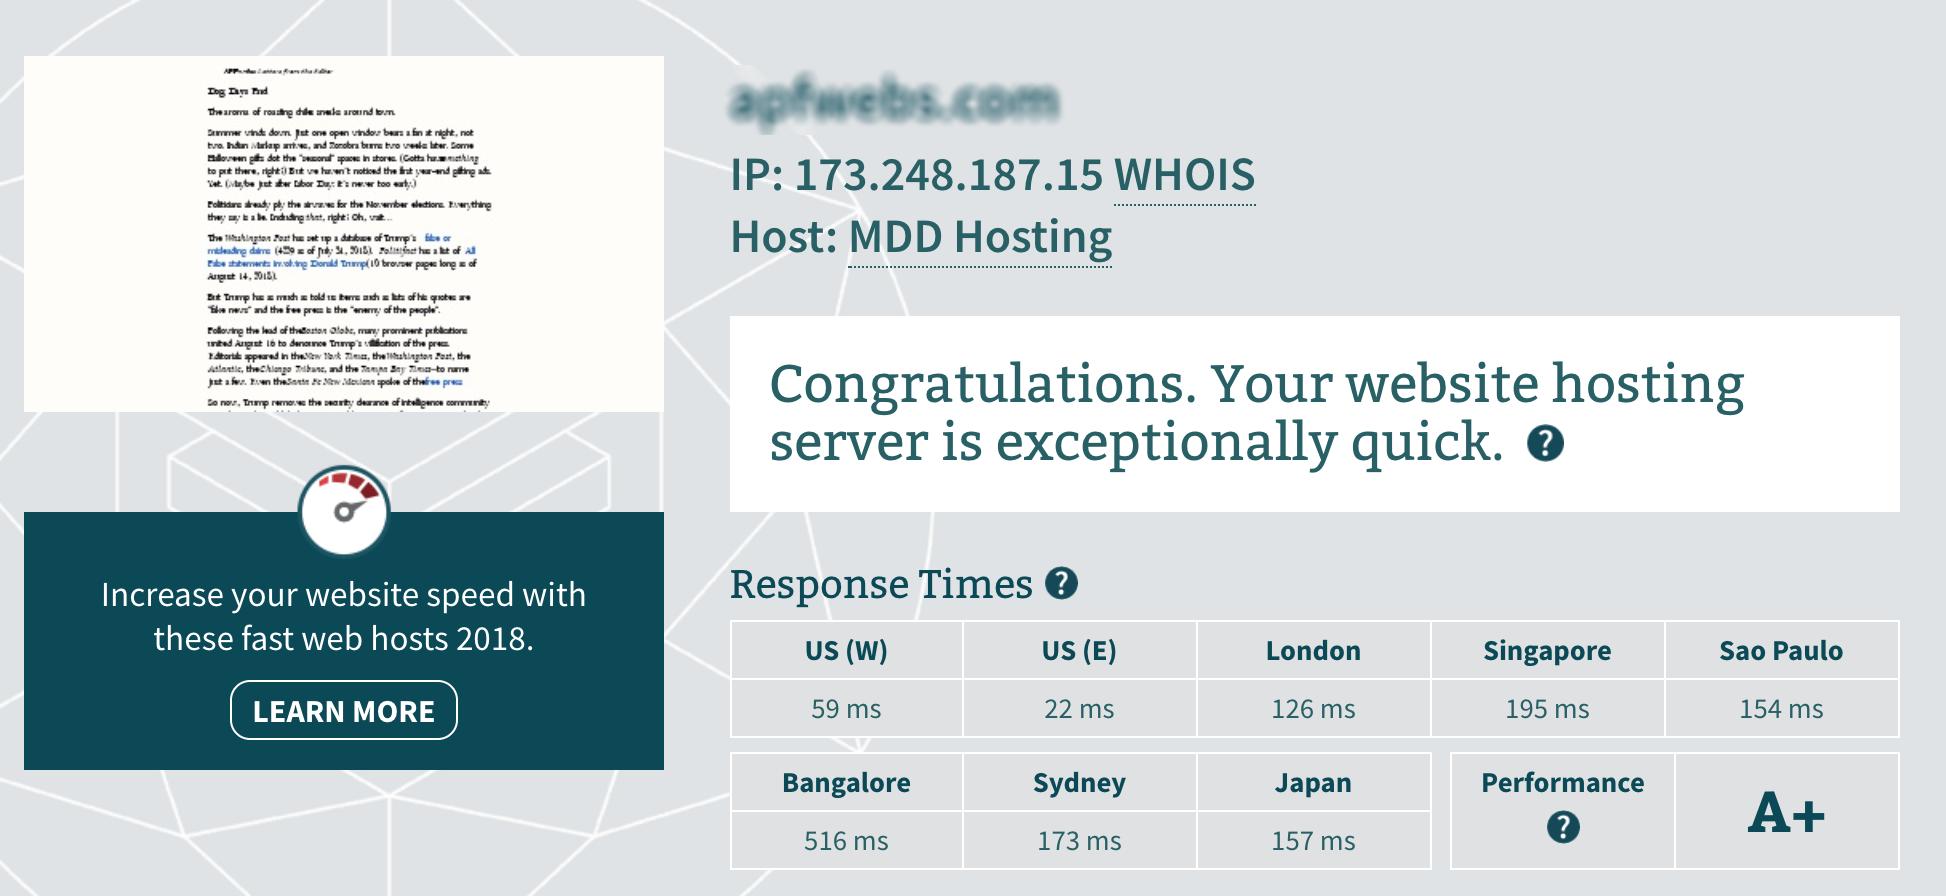 MDDHosting Server Response Time